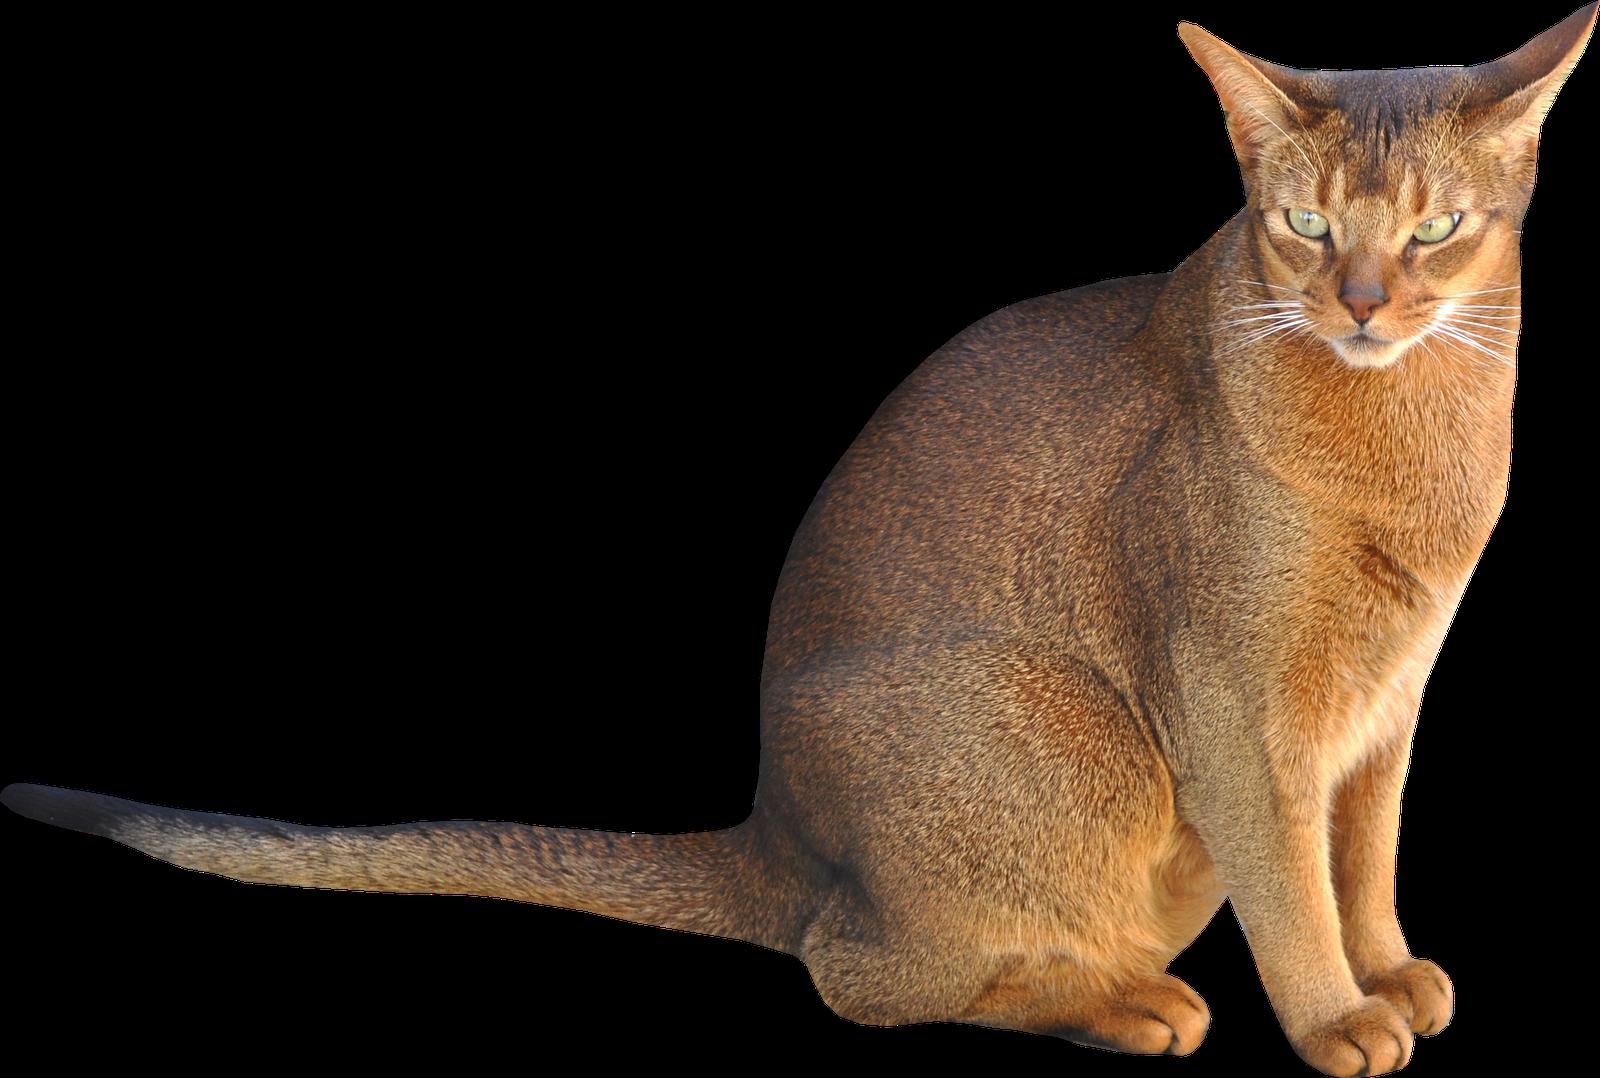 Clipart cat transparent background. Sitting png image purepng